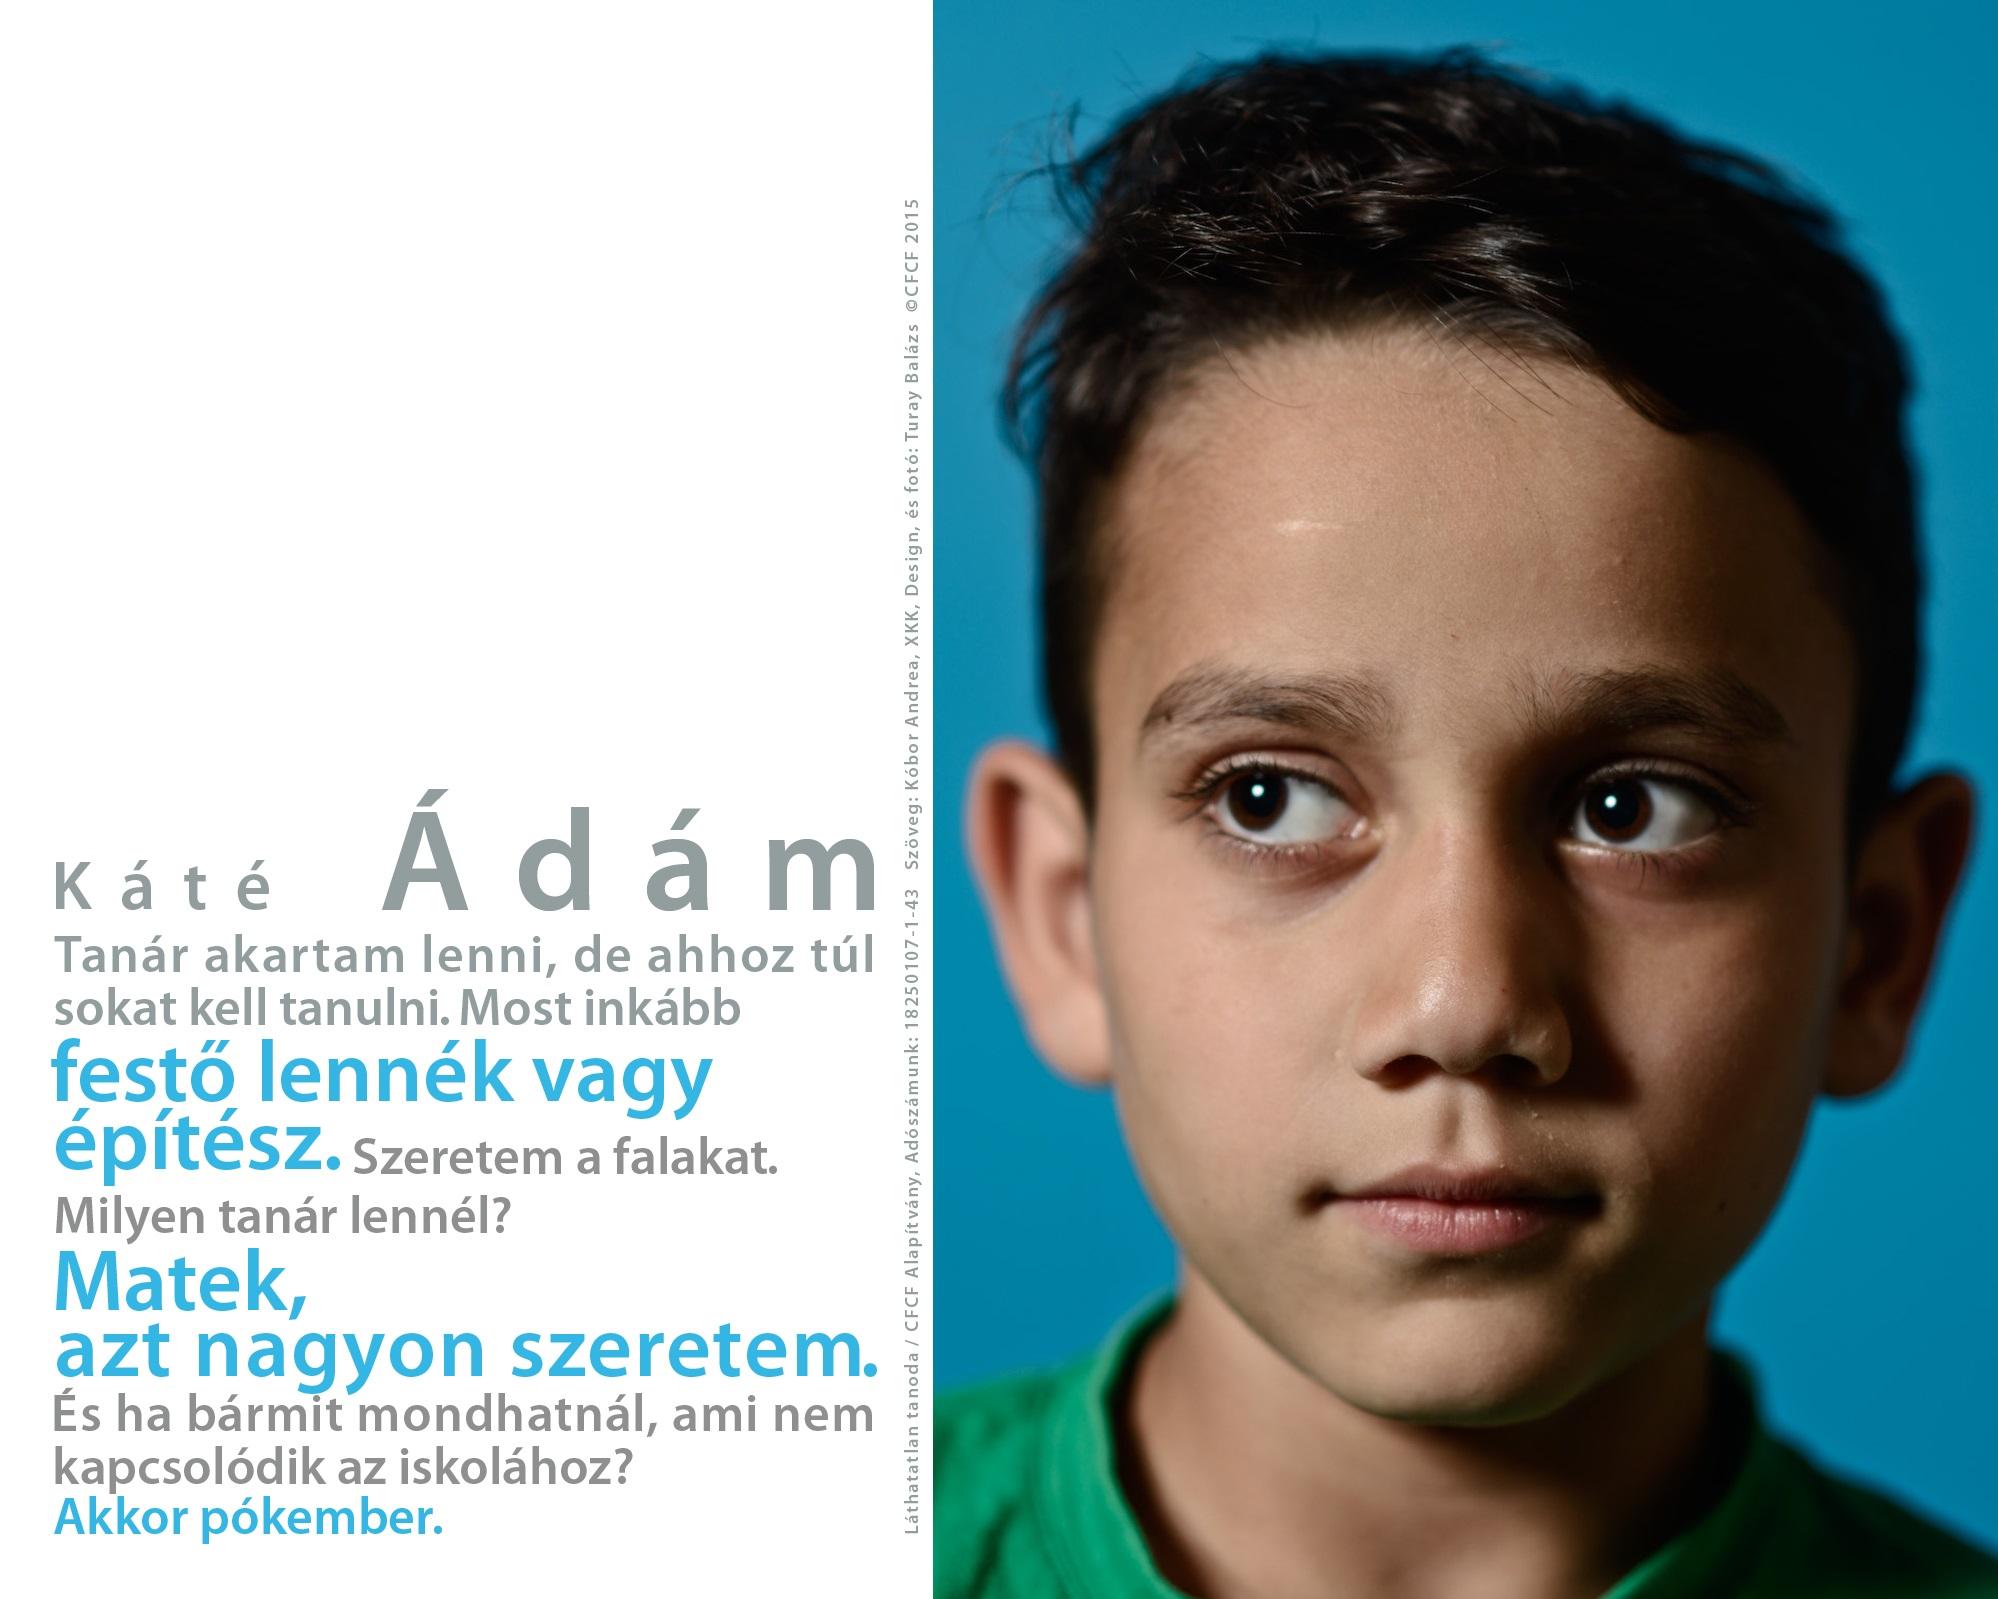 adam_1.jpg